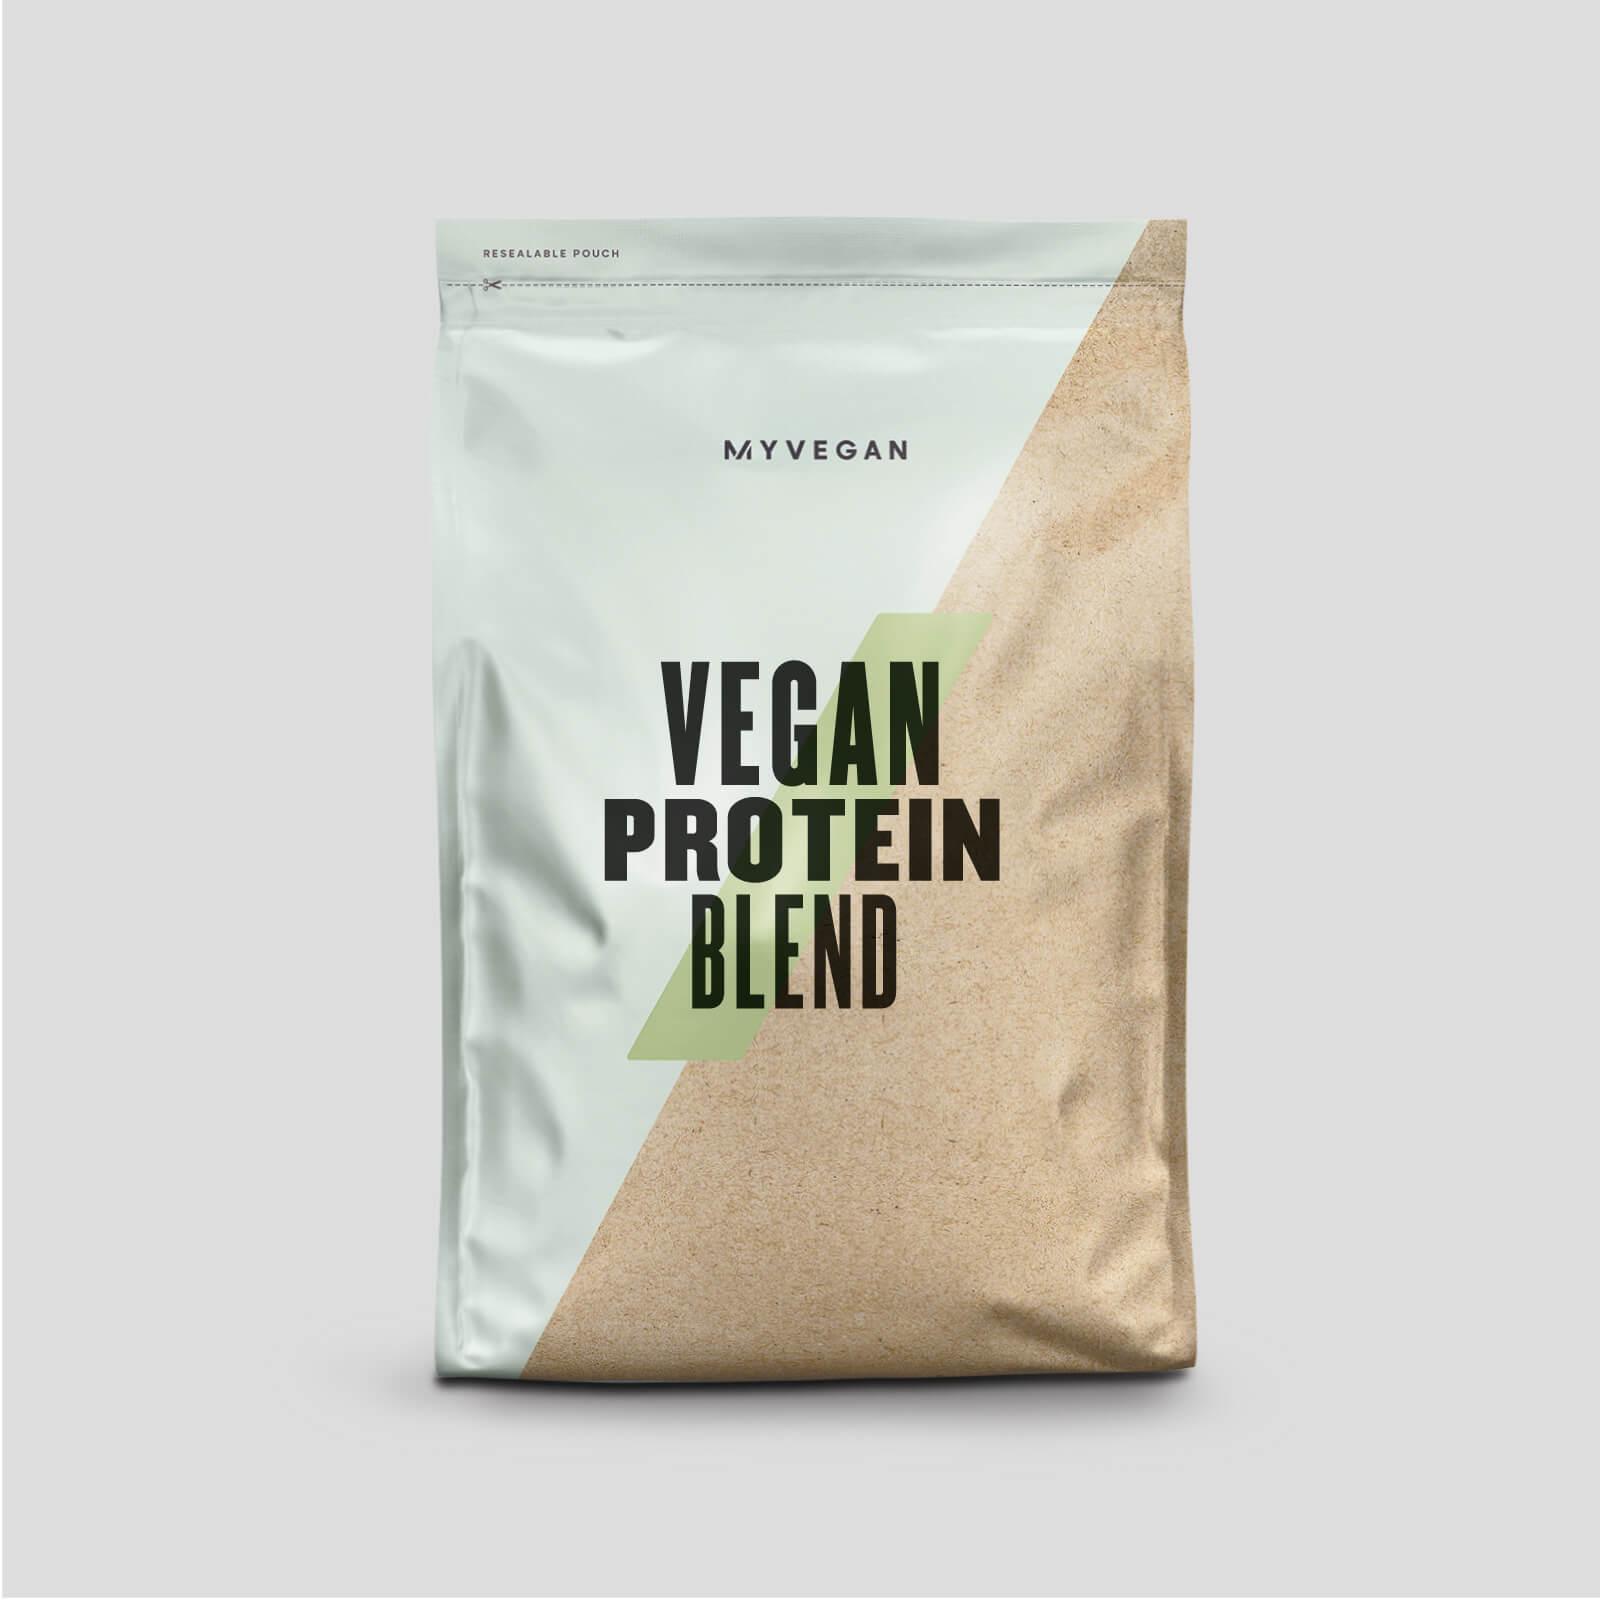 Myvegan Mélange de protéines végétales - 250g - Chocolat